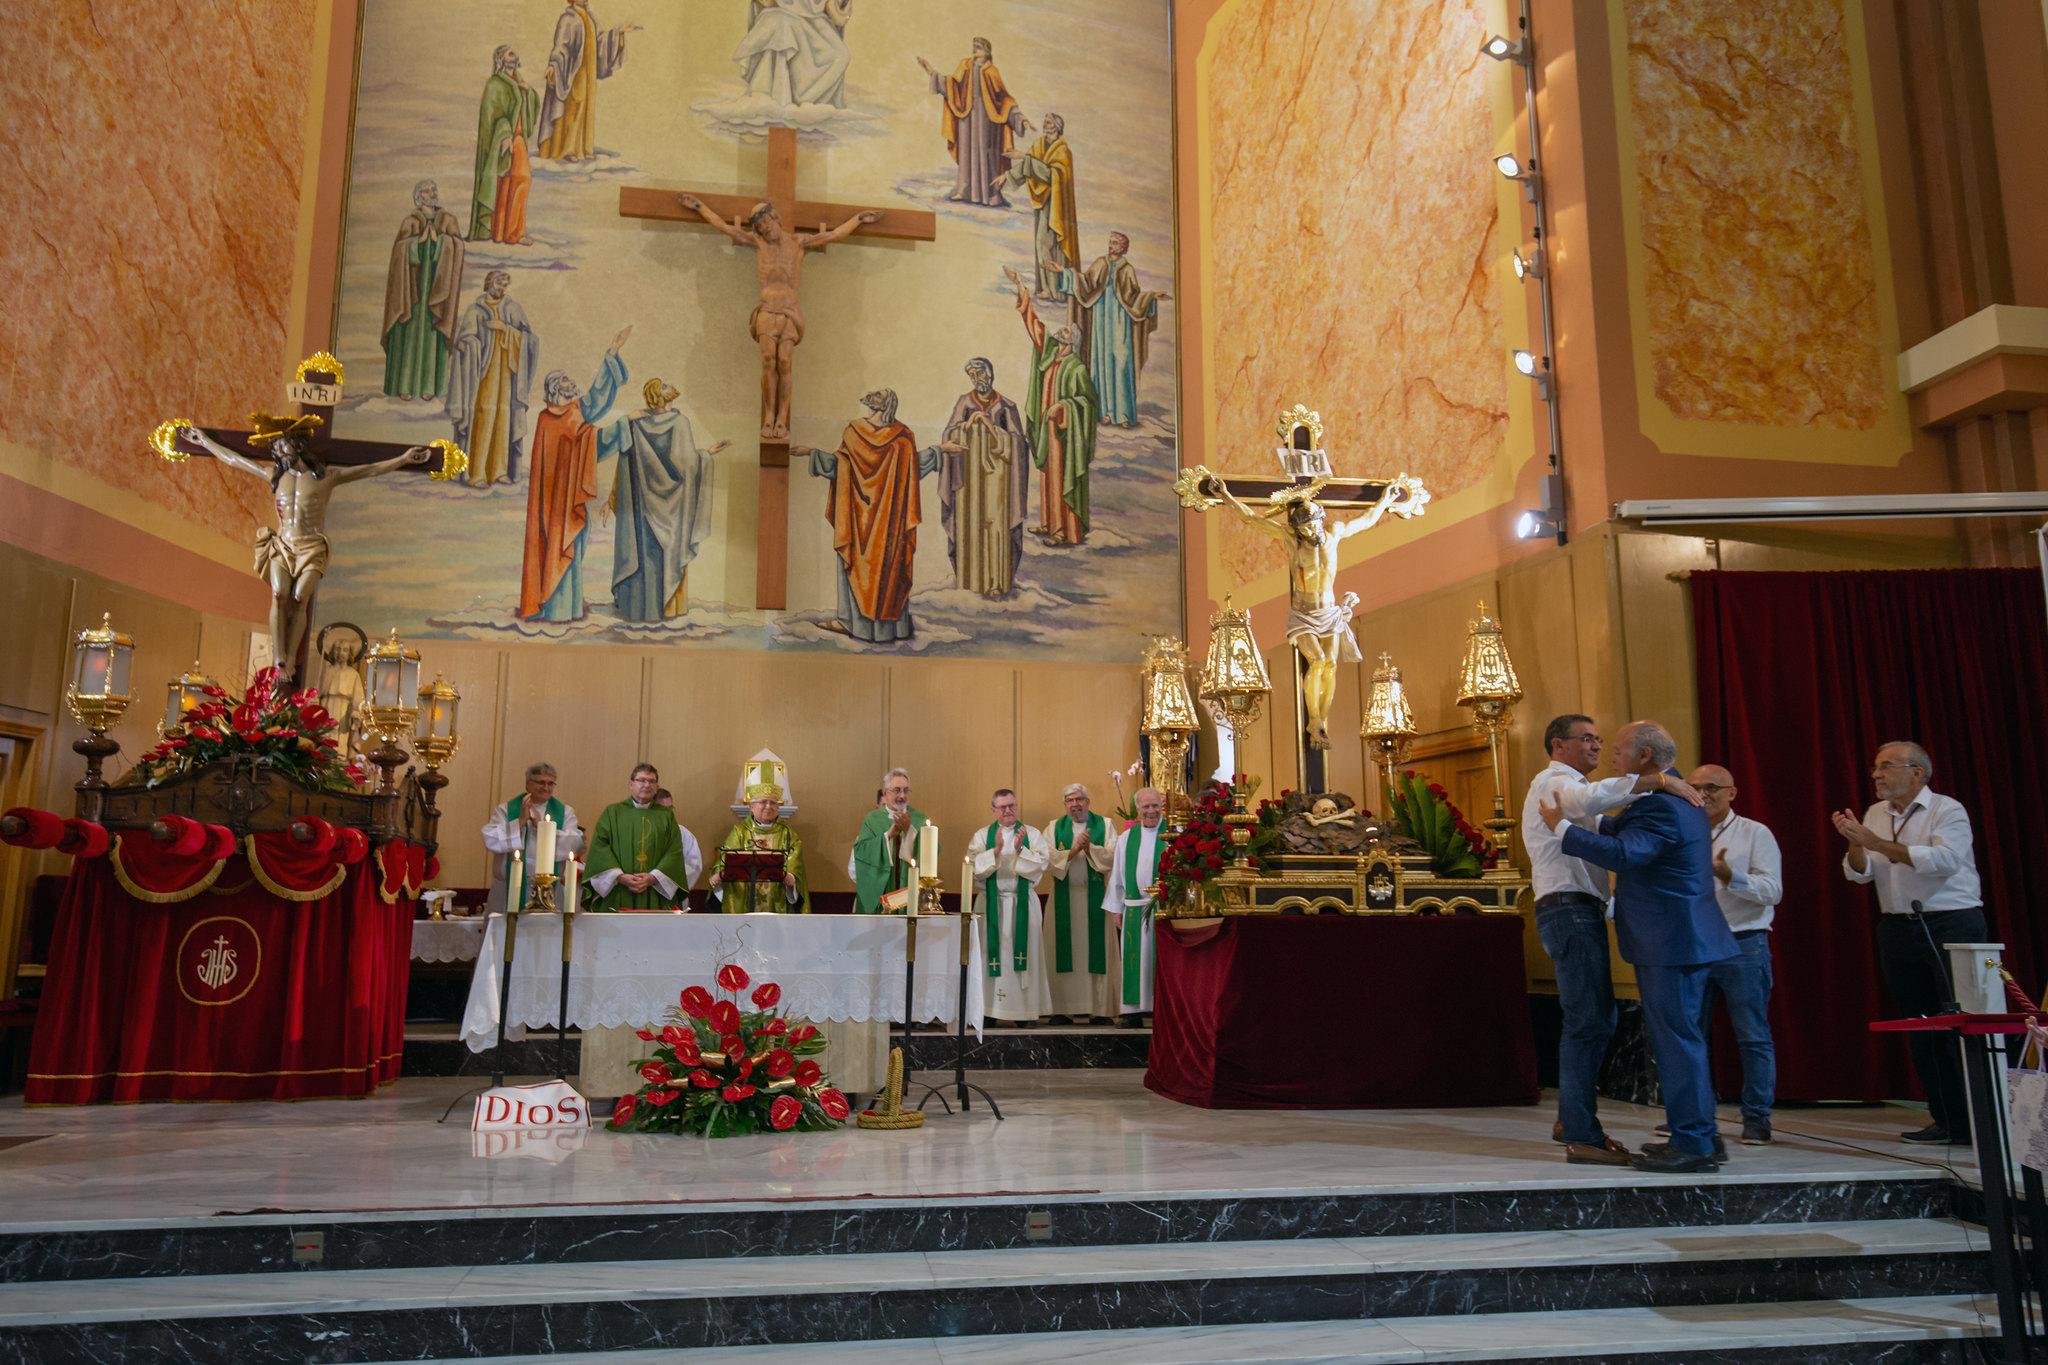 (2018-06-17) - 75 Aniversario - Encuentro - Vicent Olmos Navarro (16)